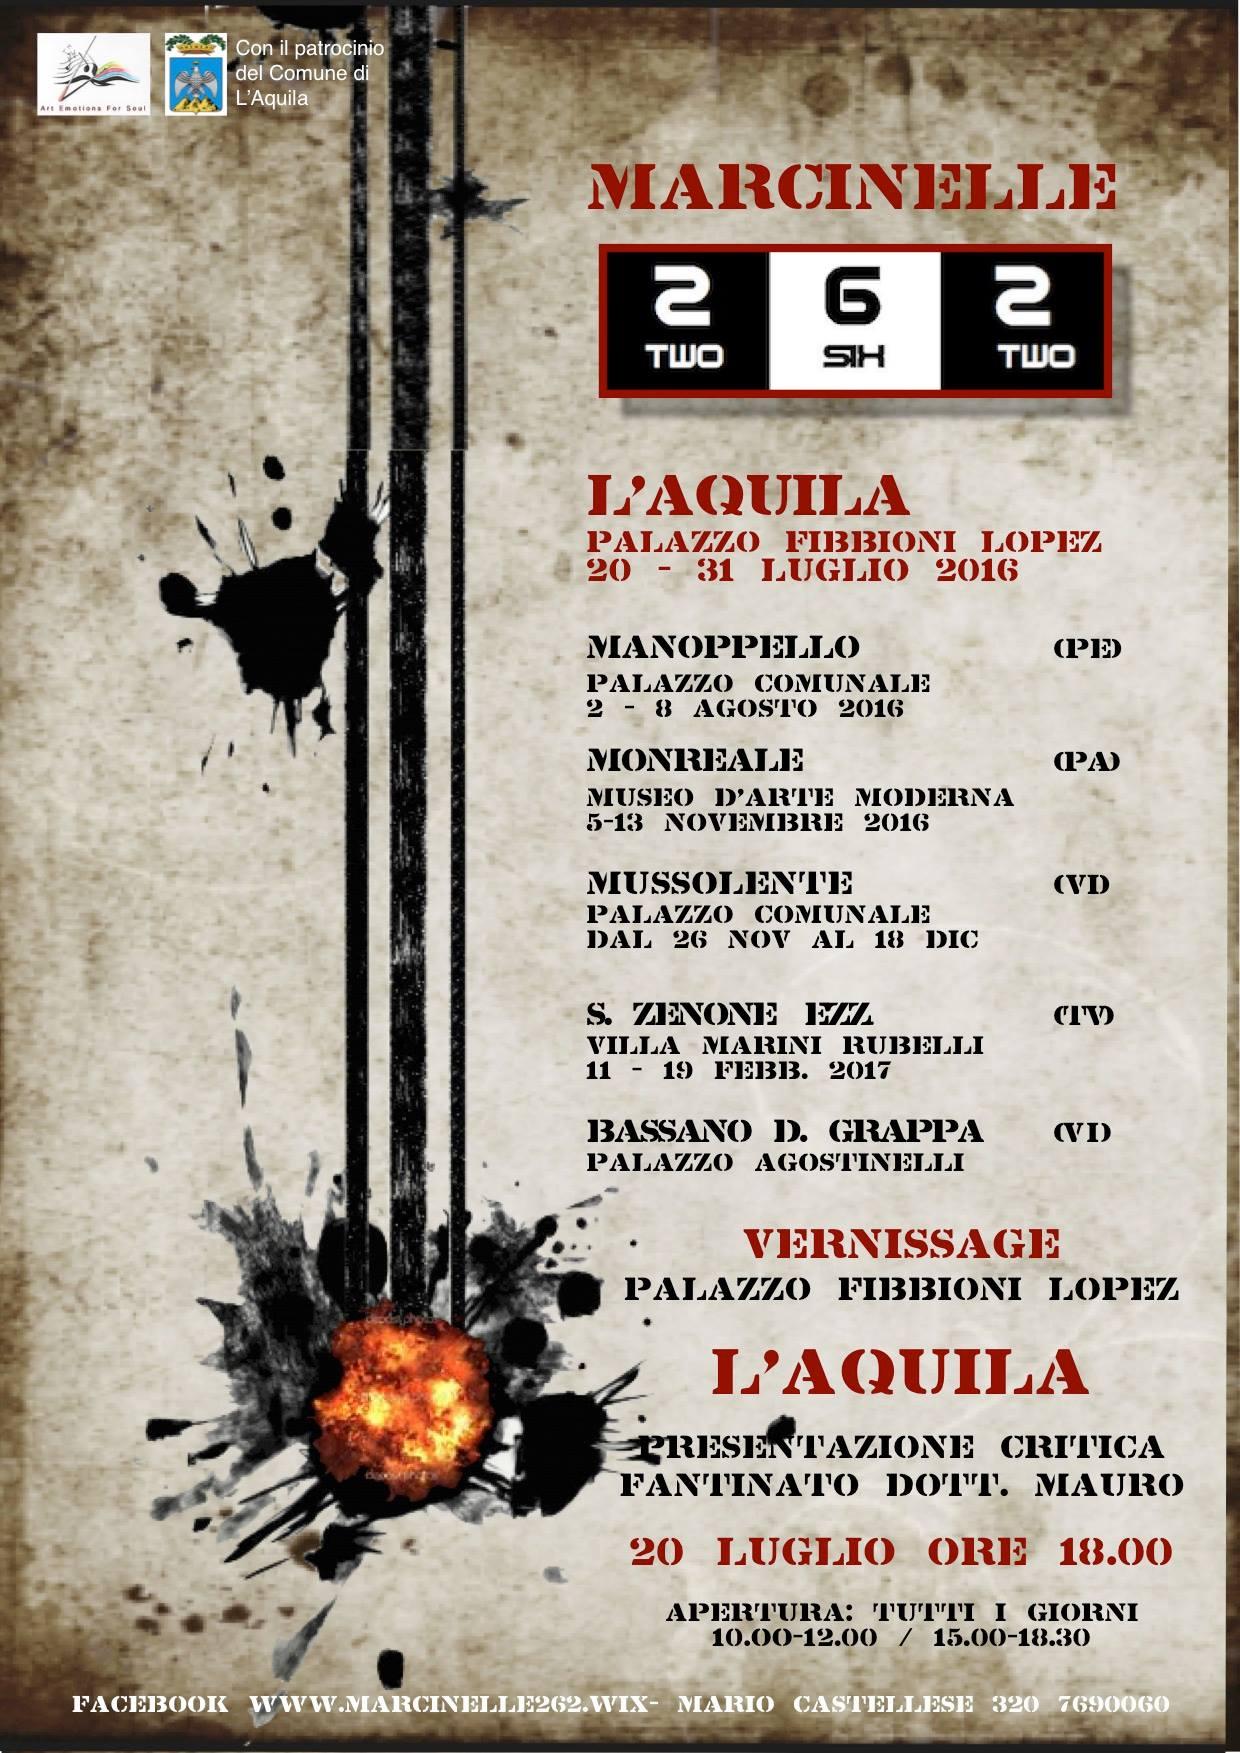 Marcinelle 262, mostra itinerante (2016)